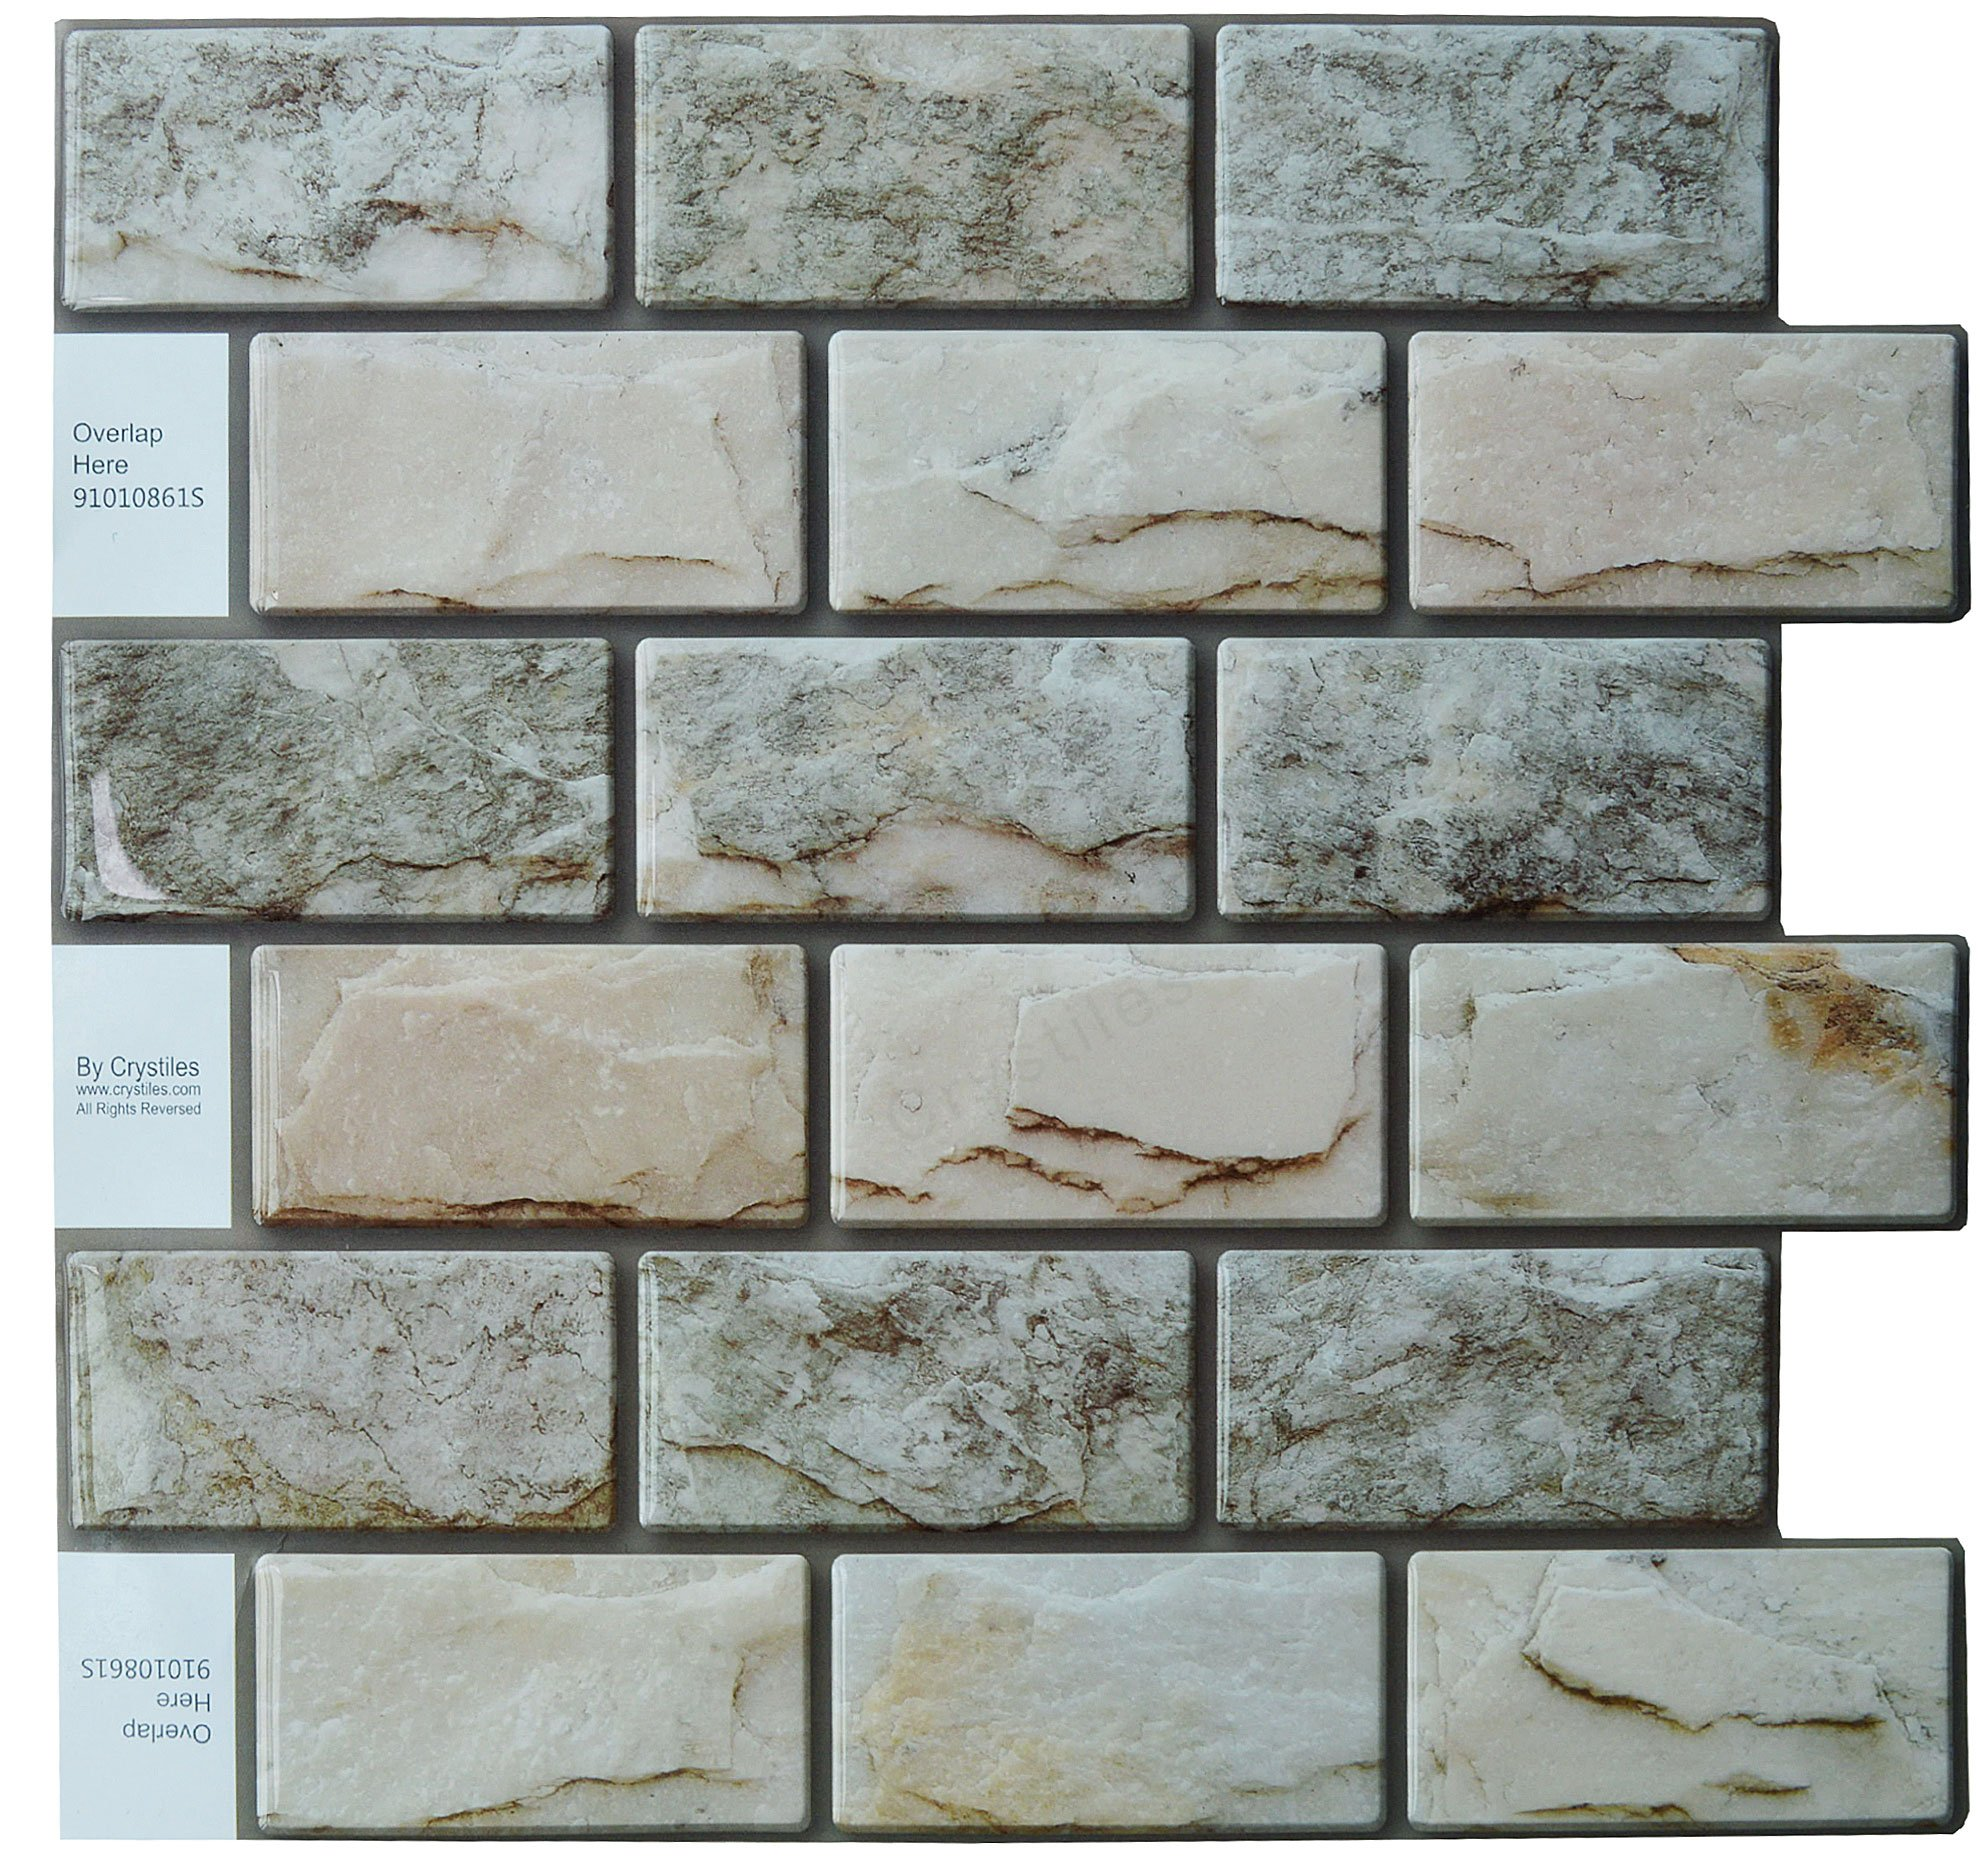 Crystiles Peel and Stick DIY Backsplash Tile Stick-on Vinyl Wall Tile, Perfect Backsplash Idea for Kitchen n Bathroom Décor Project, Natural 3D Granite, Item #91010861, 10'' X 10'' Each, 6 Sheets Pack